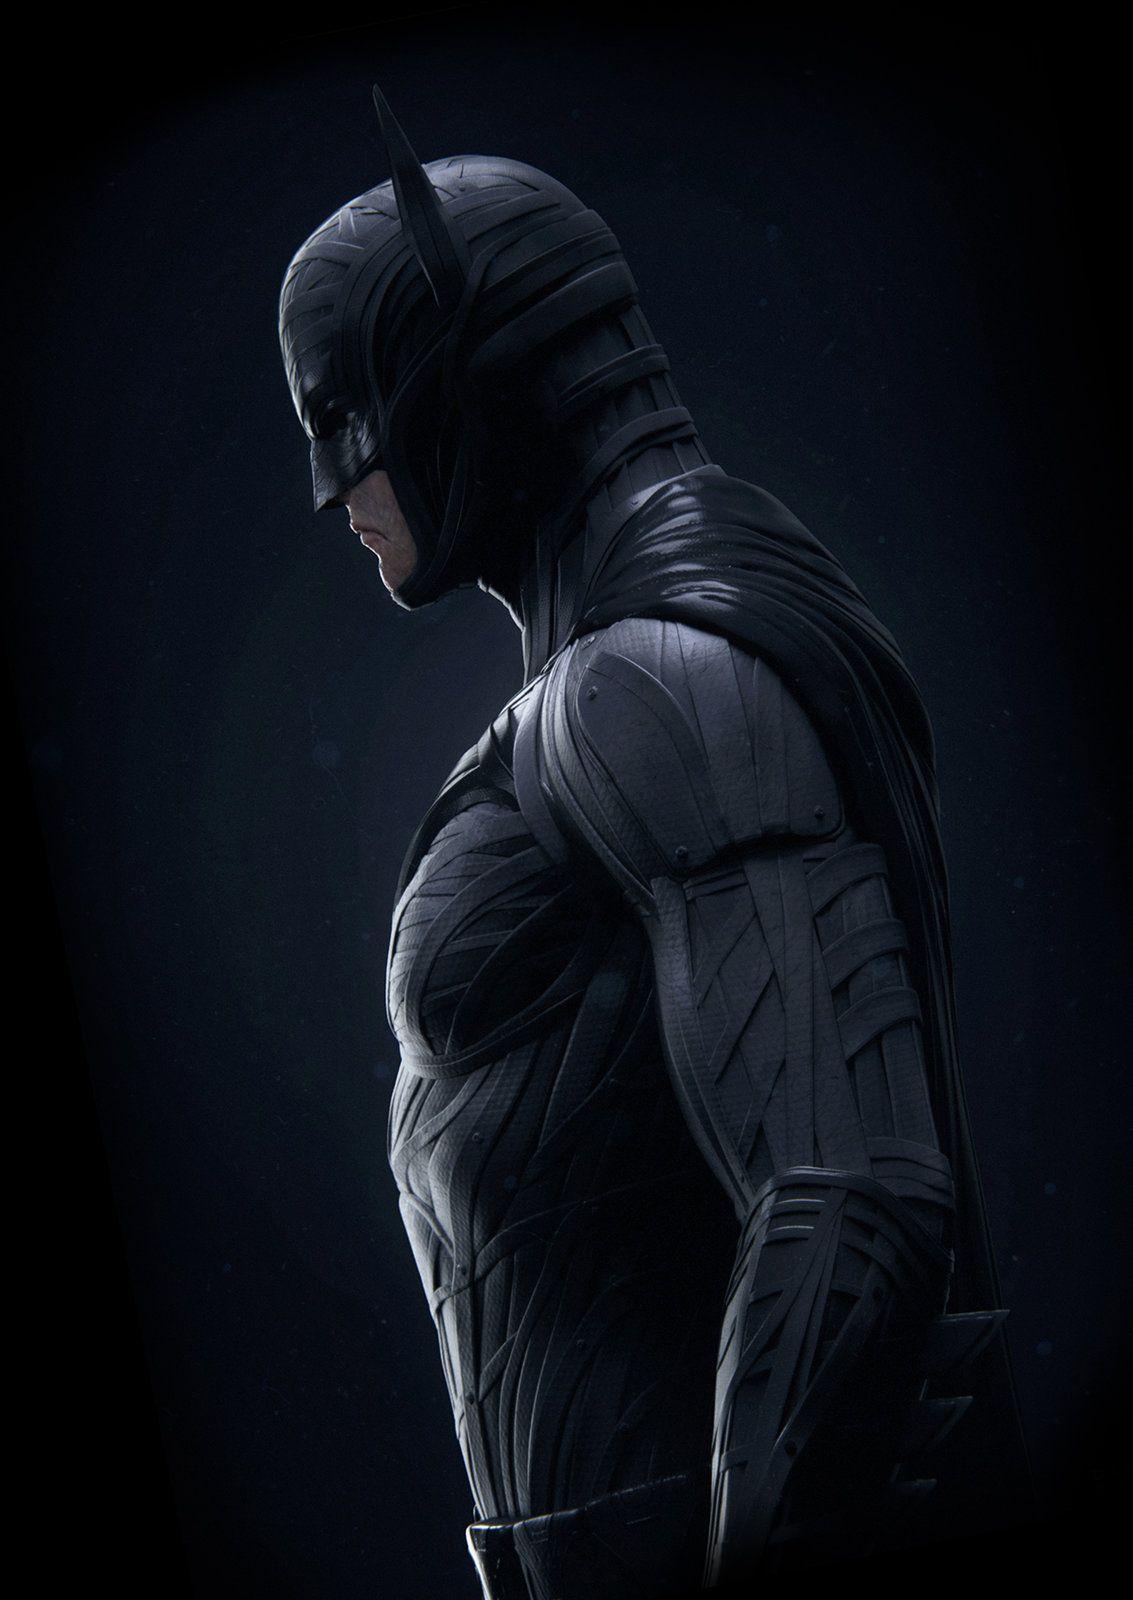 The Dark Knight, Riyahd Cassiem on ArtStation at https://www.artstation.com/artwork/the-dark-knight-76b361be-56f9-444a-b01b-0dcfd9b6ba0f